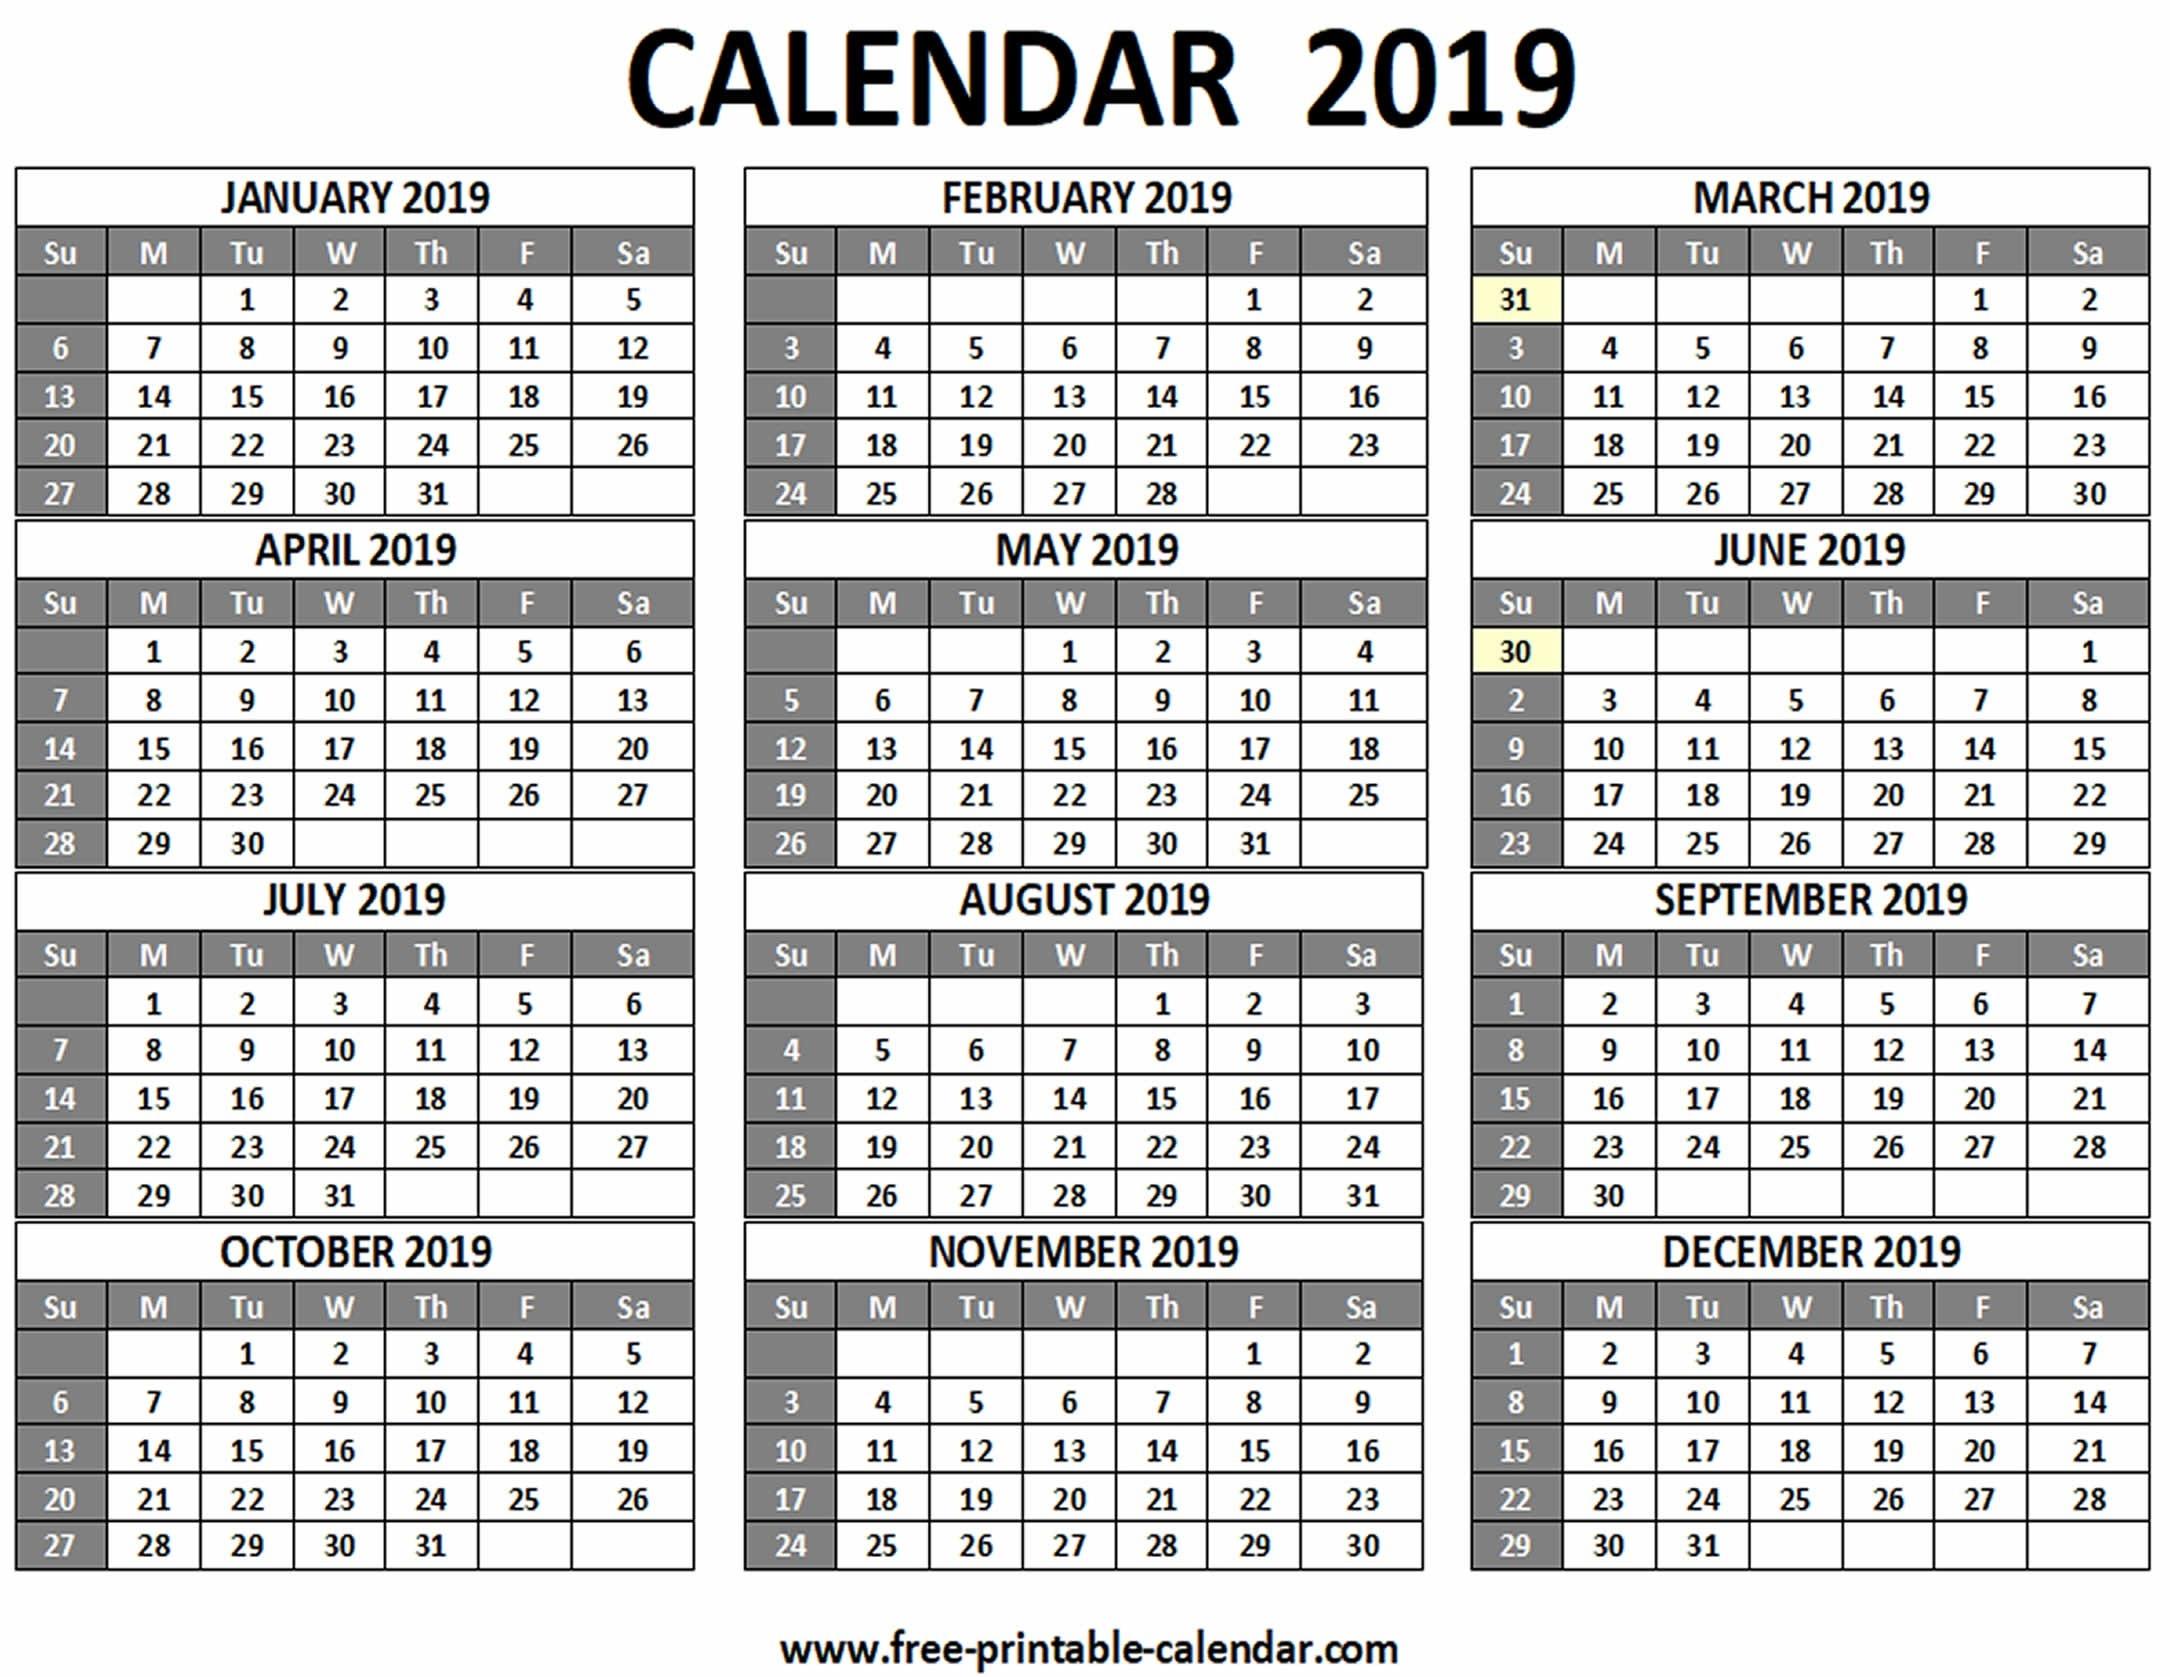 Printable 2019 Calendar - Free-Printable-Calendar  Free 12 Month Printable Calendars